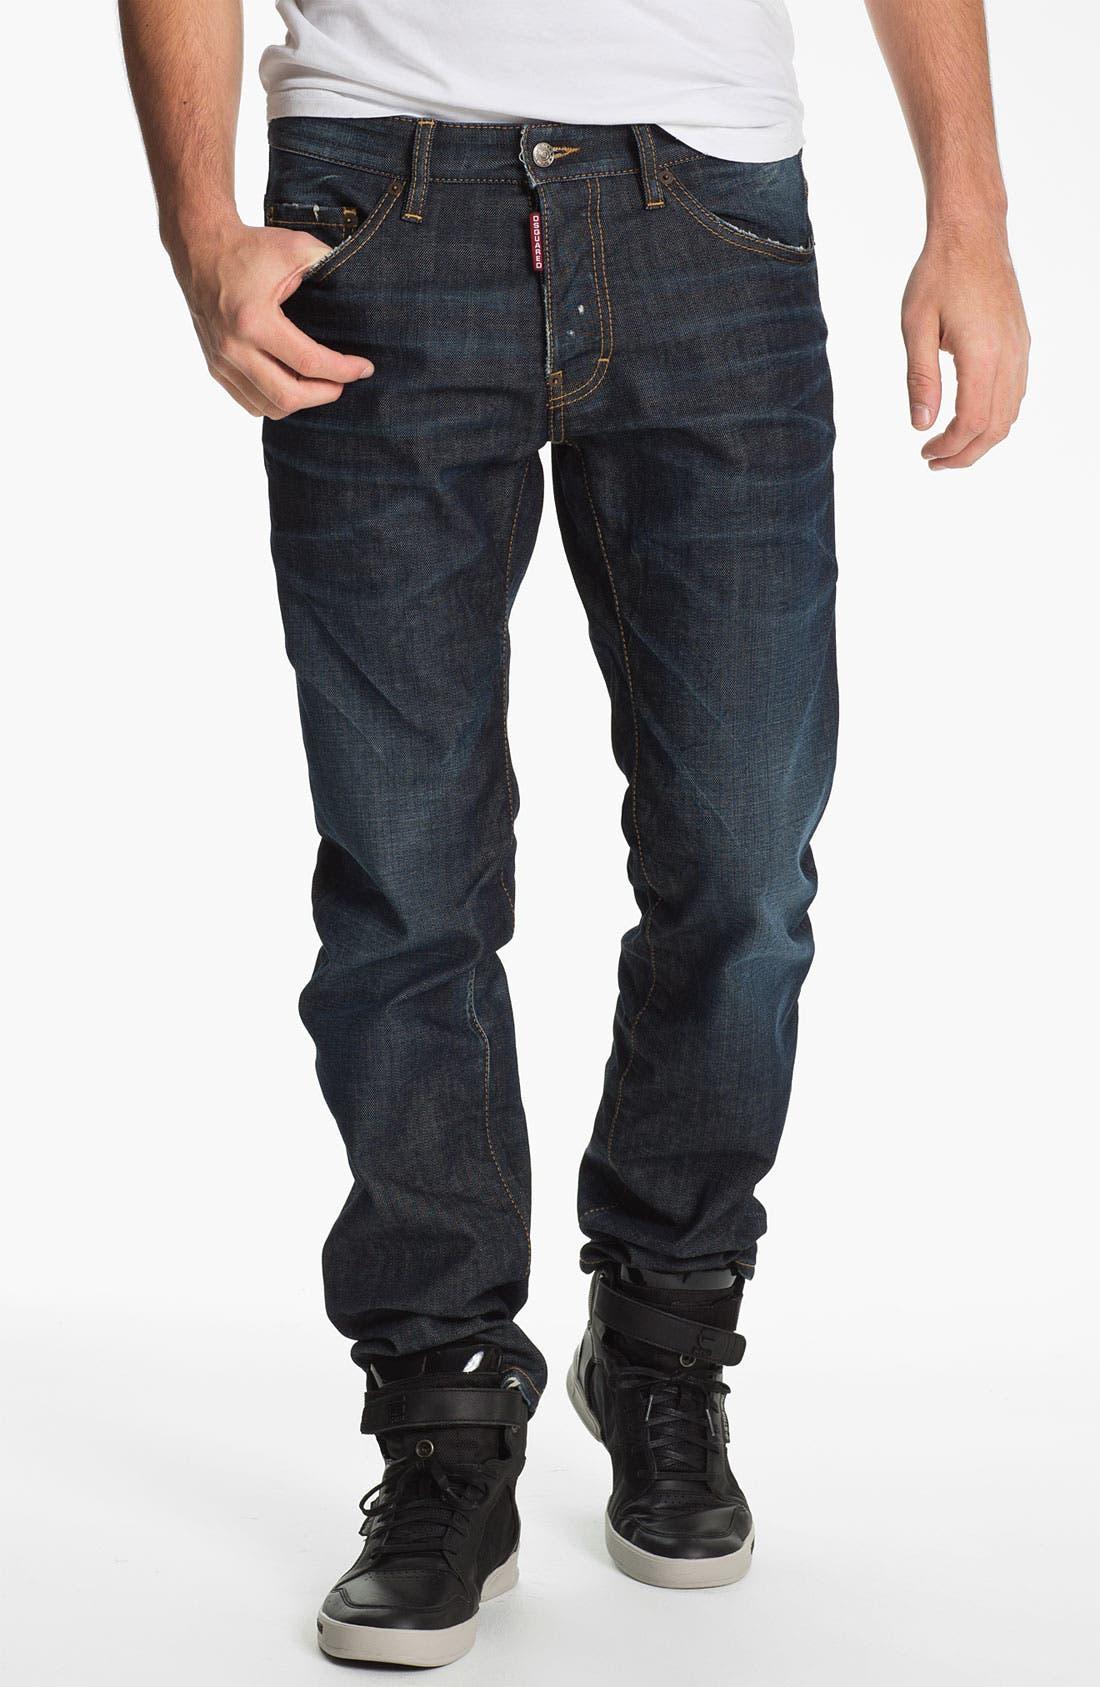 Alternate Image 1 Selected - Dsquared2 'Dean' Straight Leg Jeans (Blue)